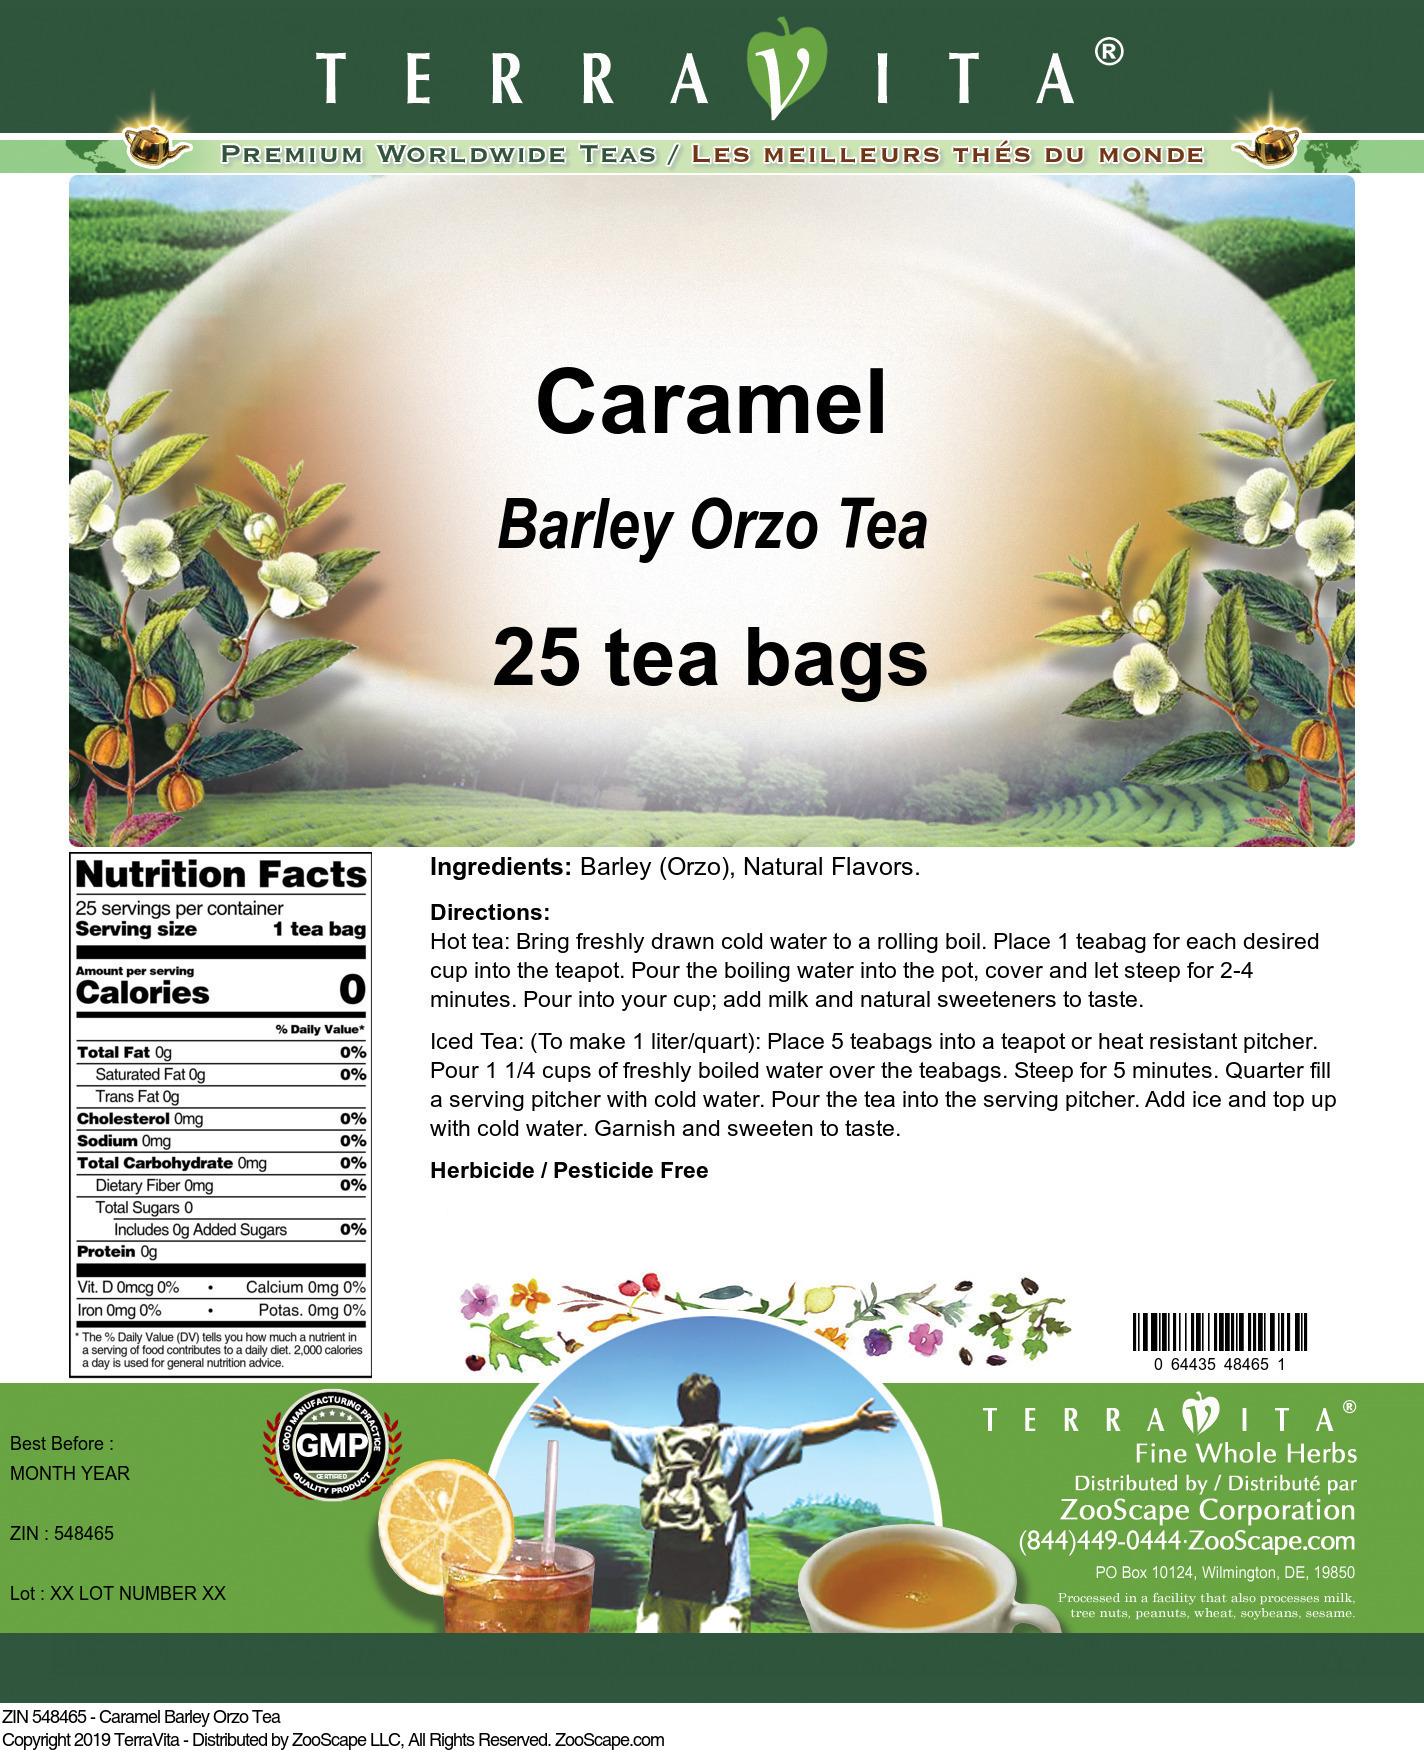 Caramel Barley Orzo